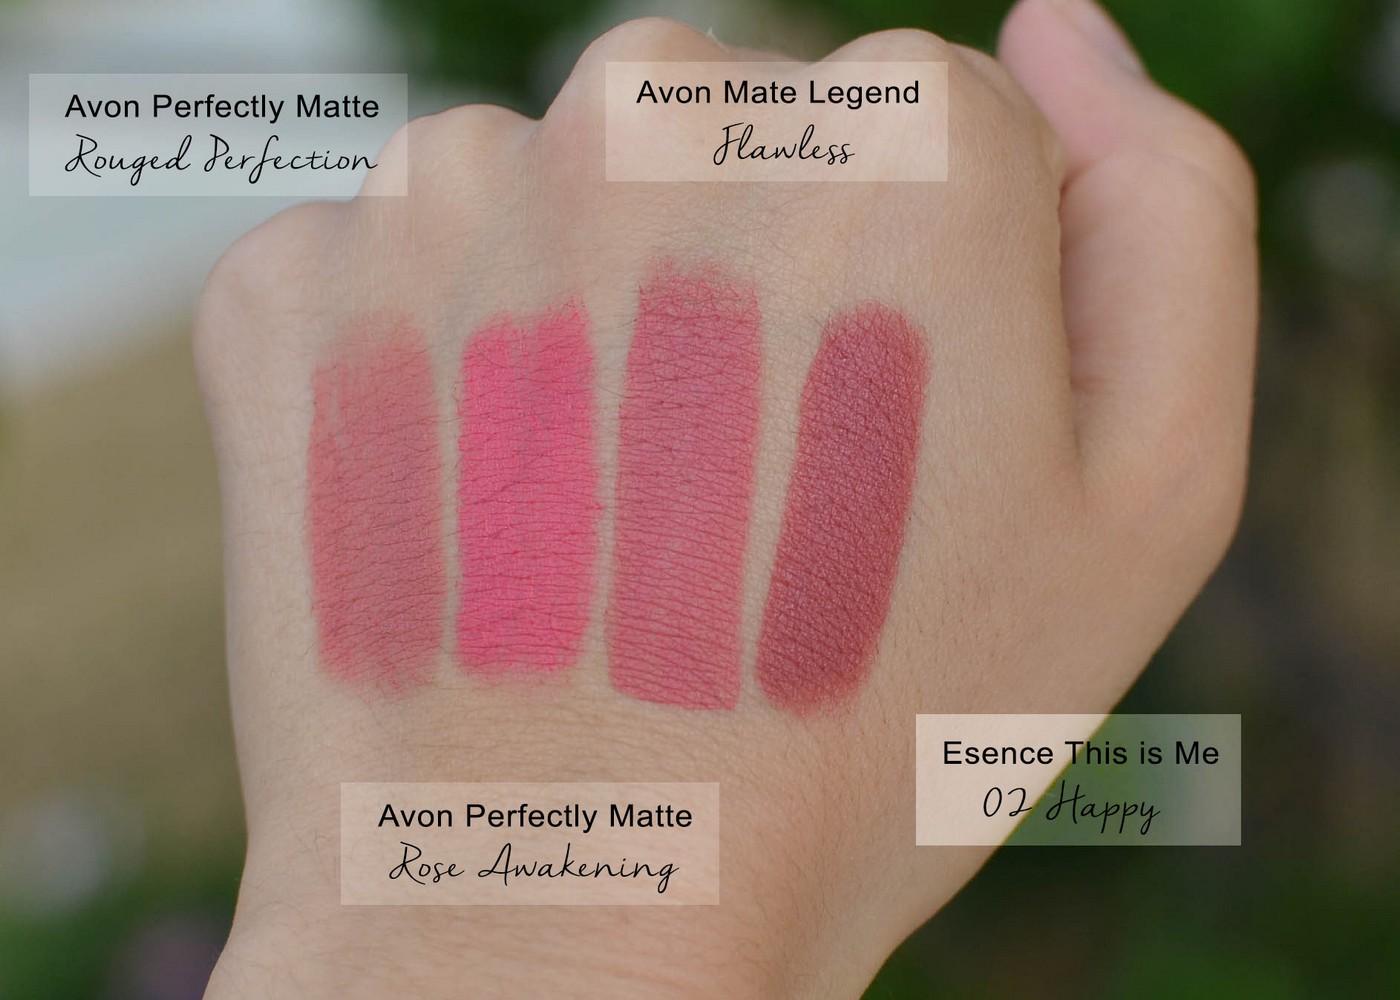 Avon True Matte Legend Lipstick Flawless